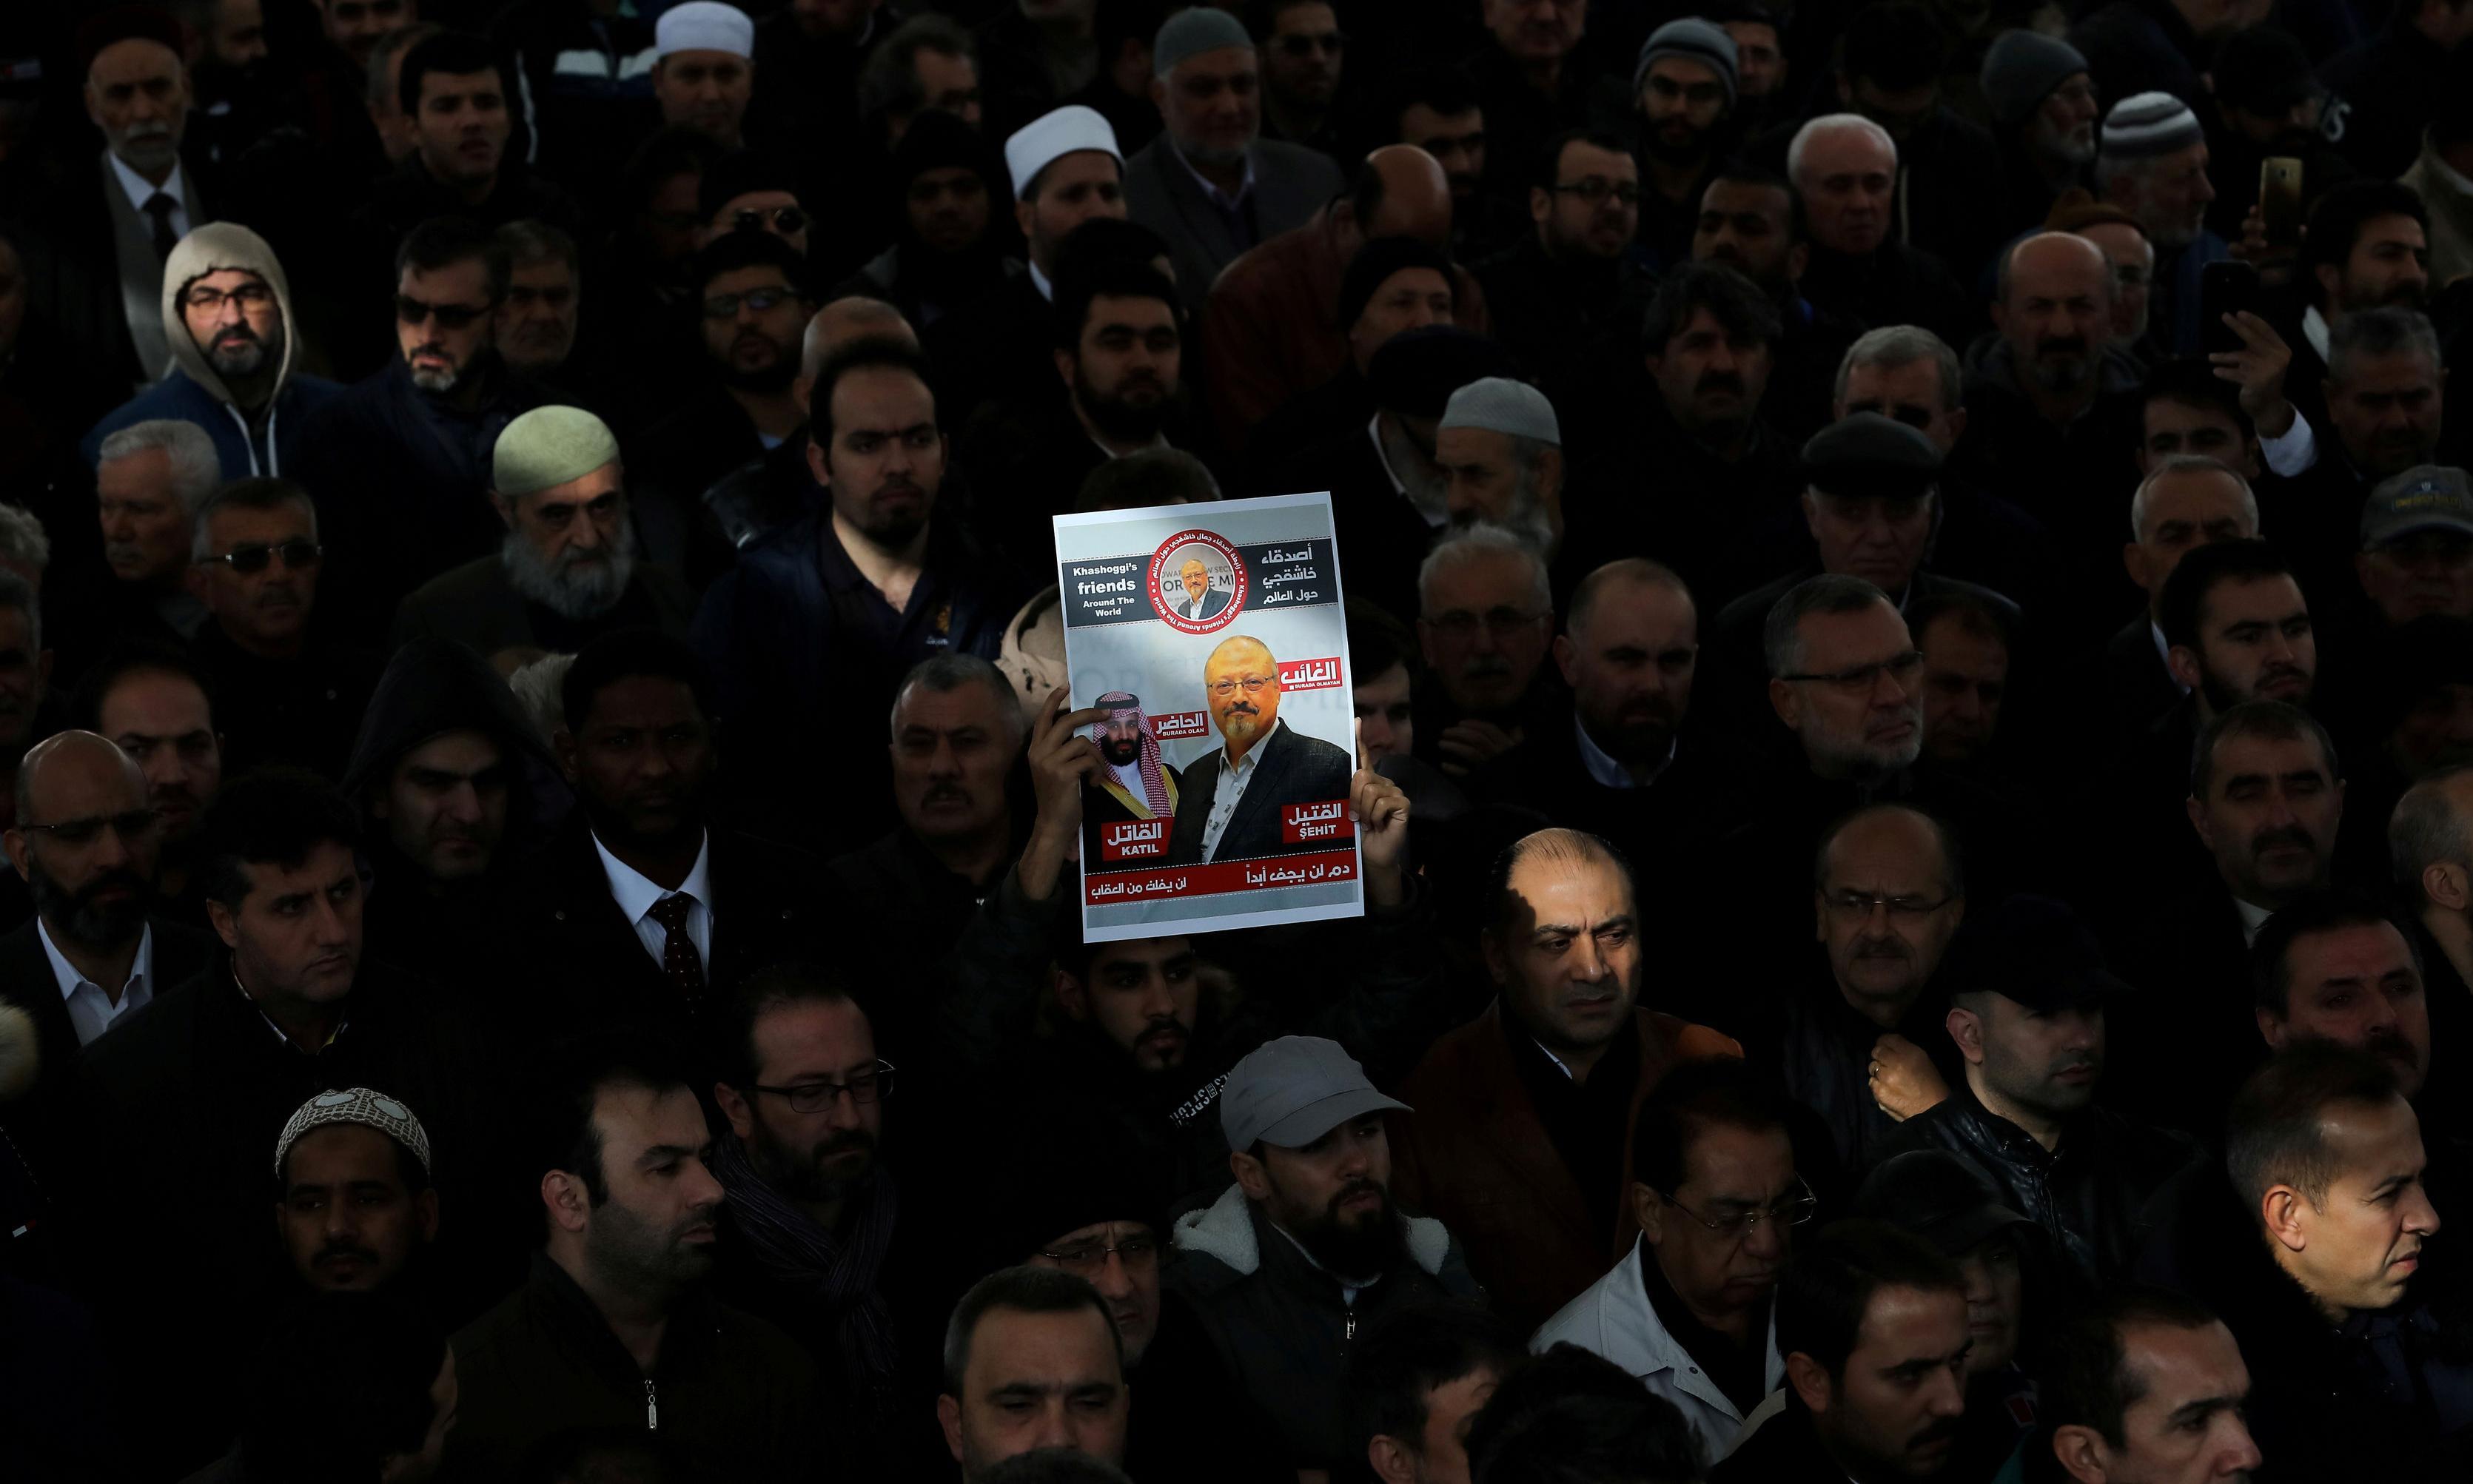 The Guardian view on Jamal Khashoggi's murder: Saudi Arabia and its friends